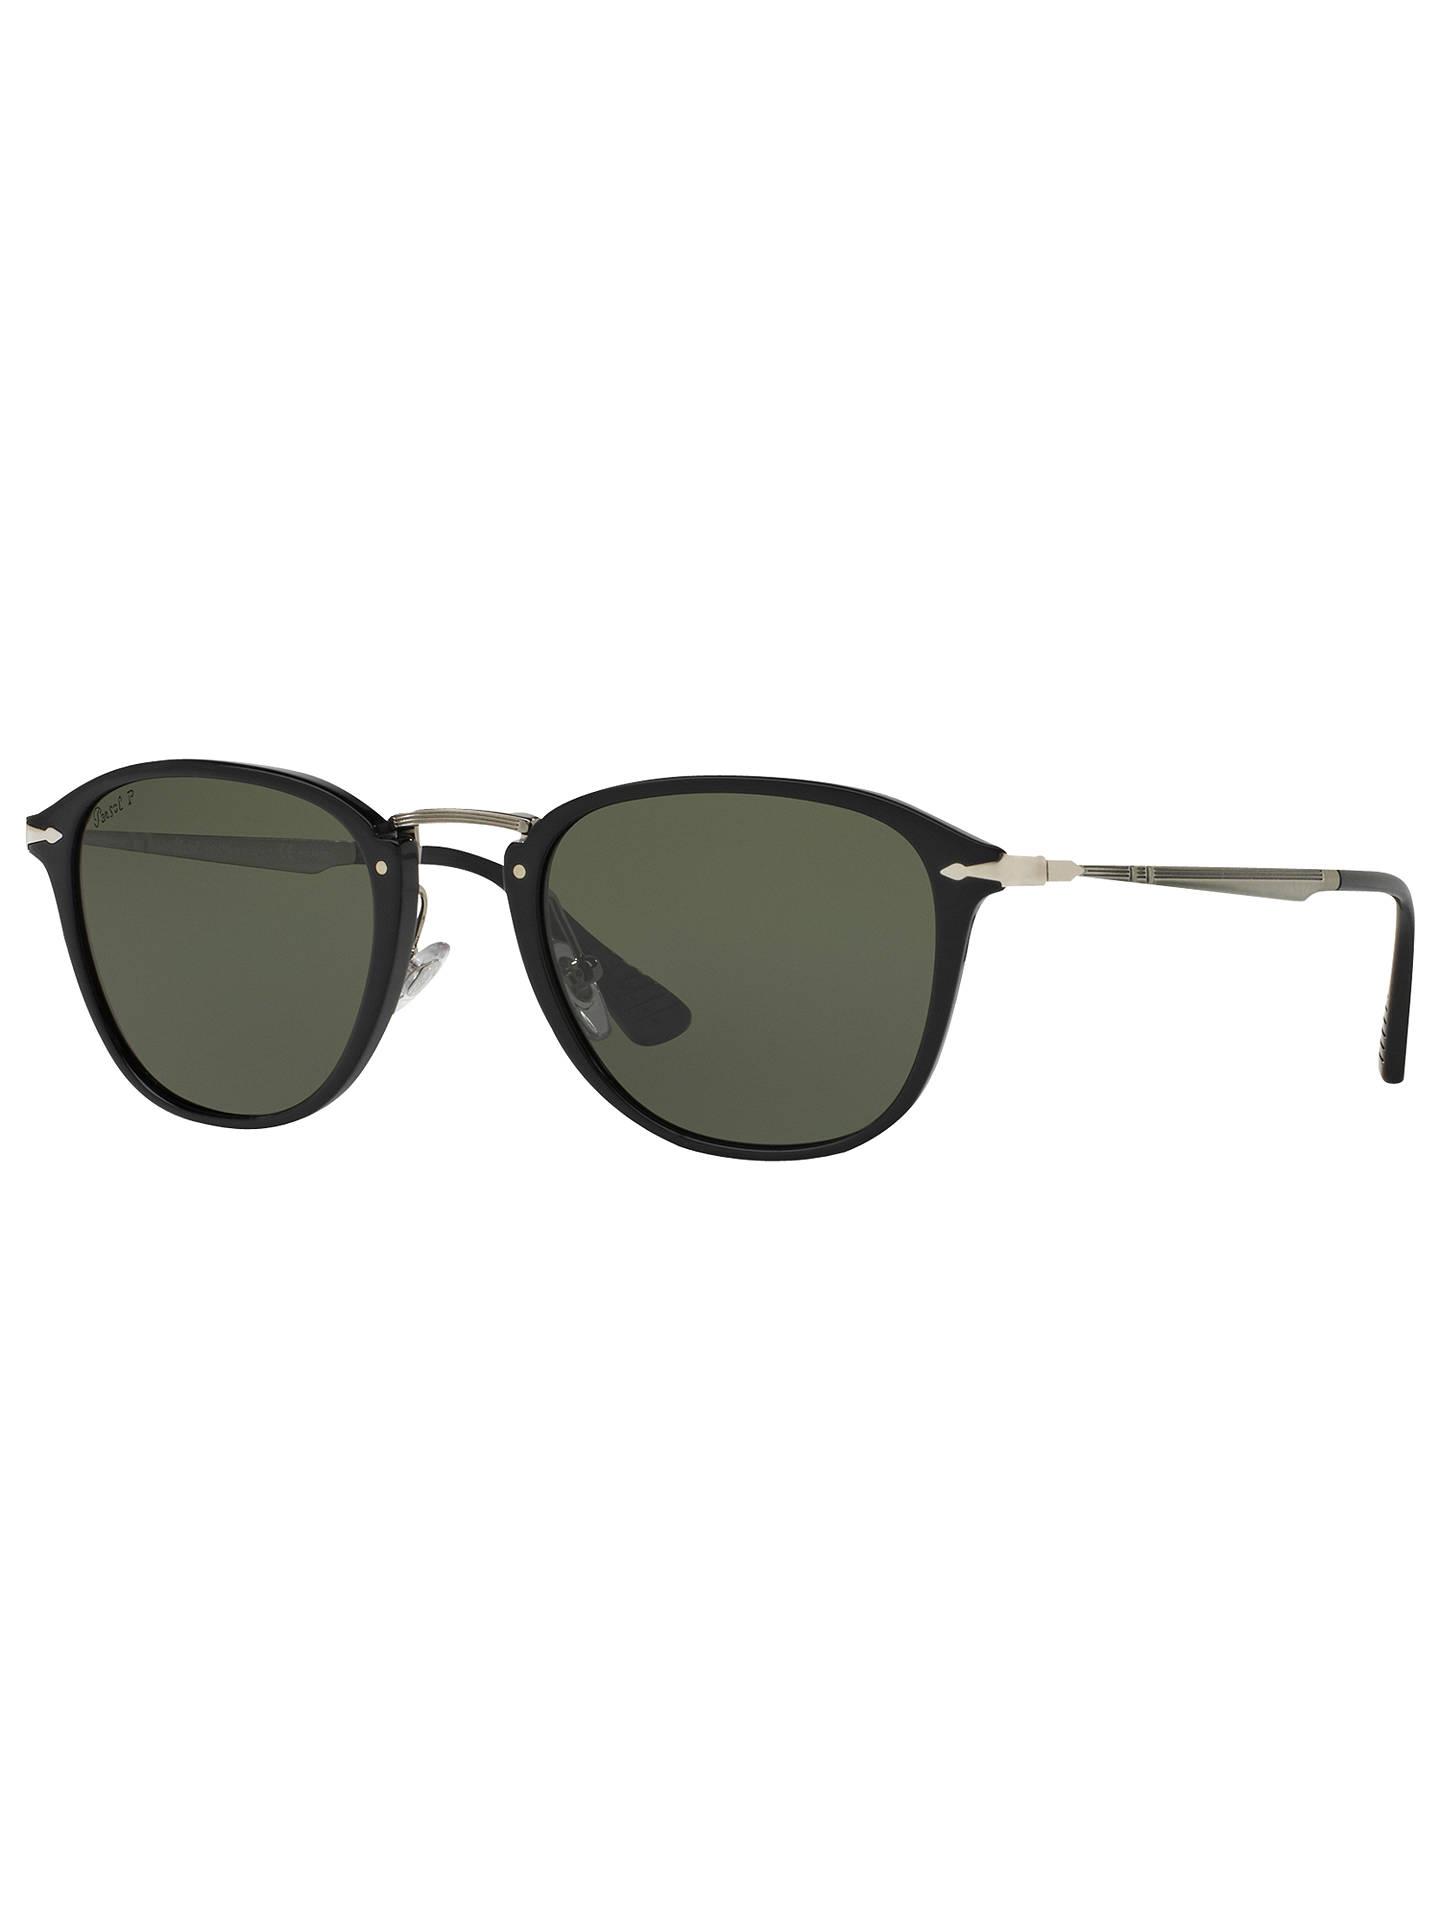 7fbd47008b Persol PO3165S Polarised D-Frame Sunglasses at John Lewis   Partners